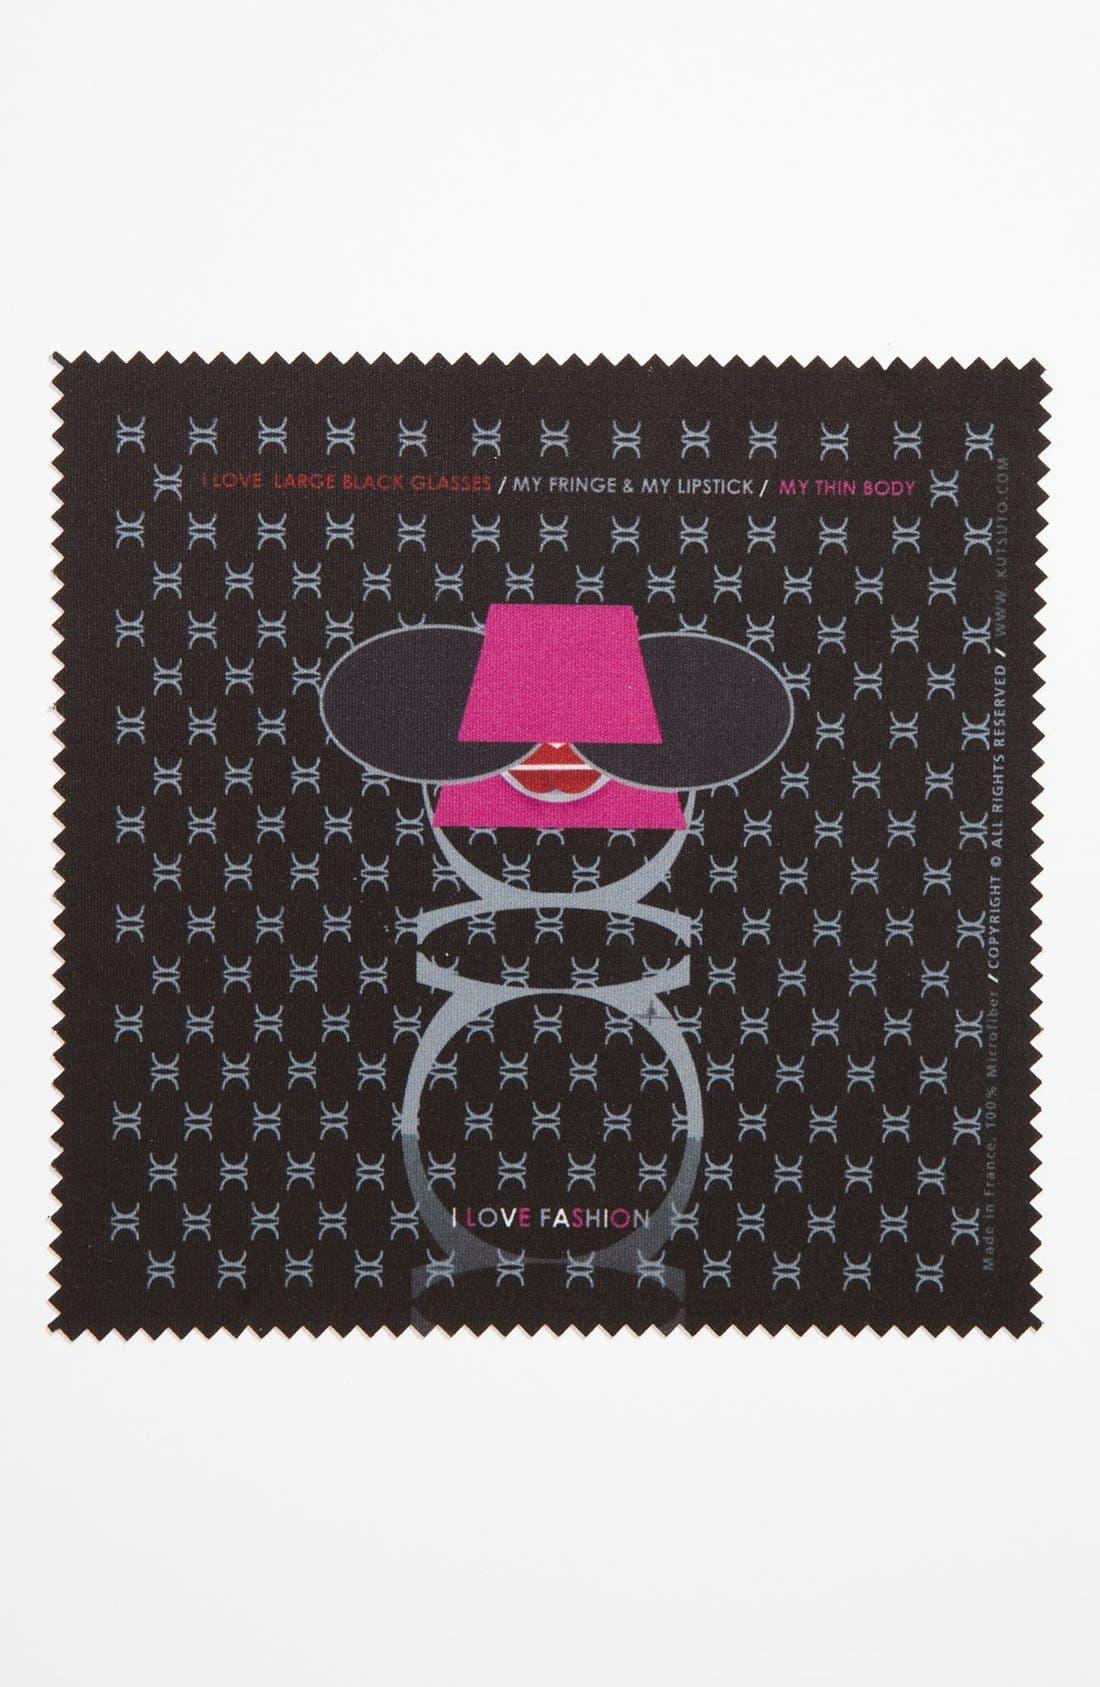 Alternate Image 1 Selected - KUTSUTO 'Kutsinette - I Love Fashion' Microfiber Cloth